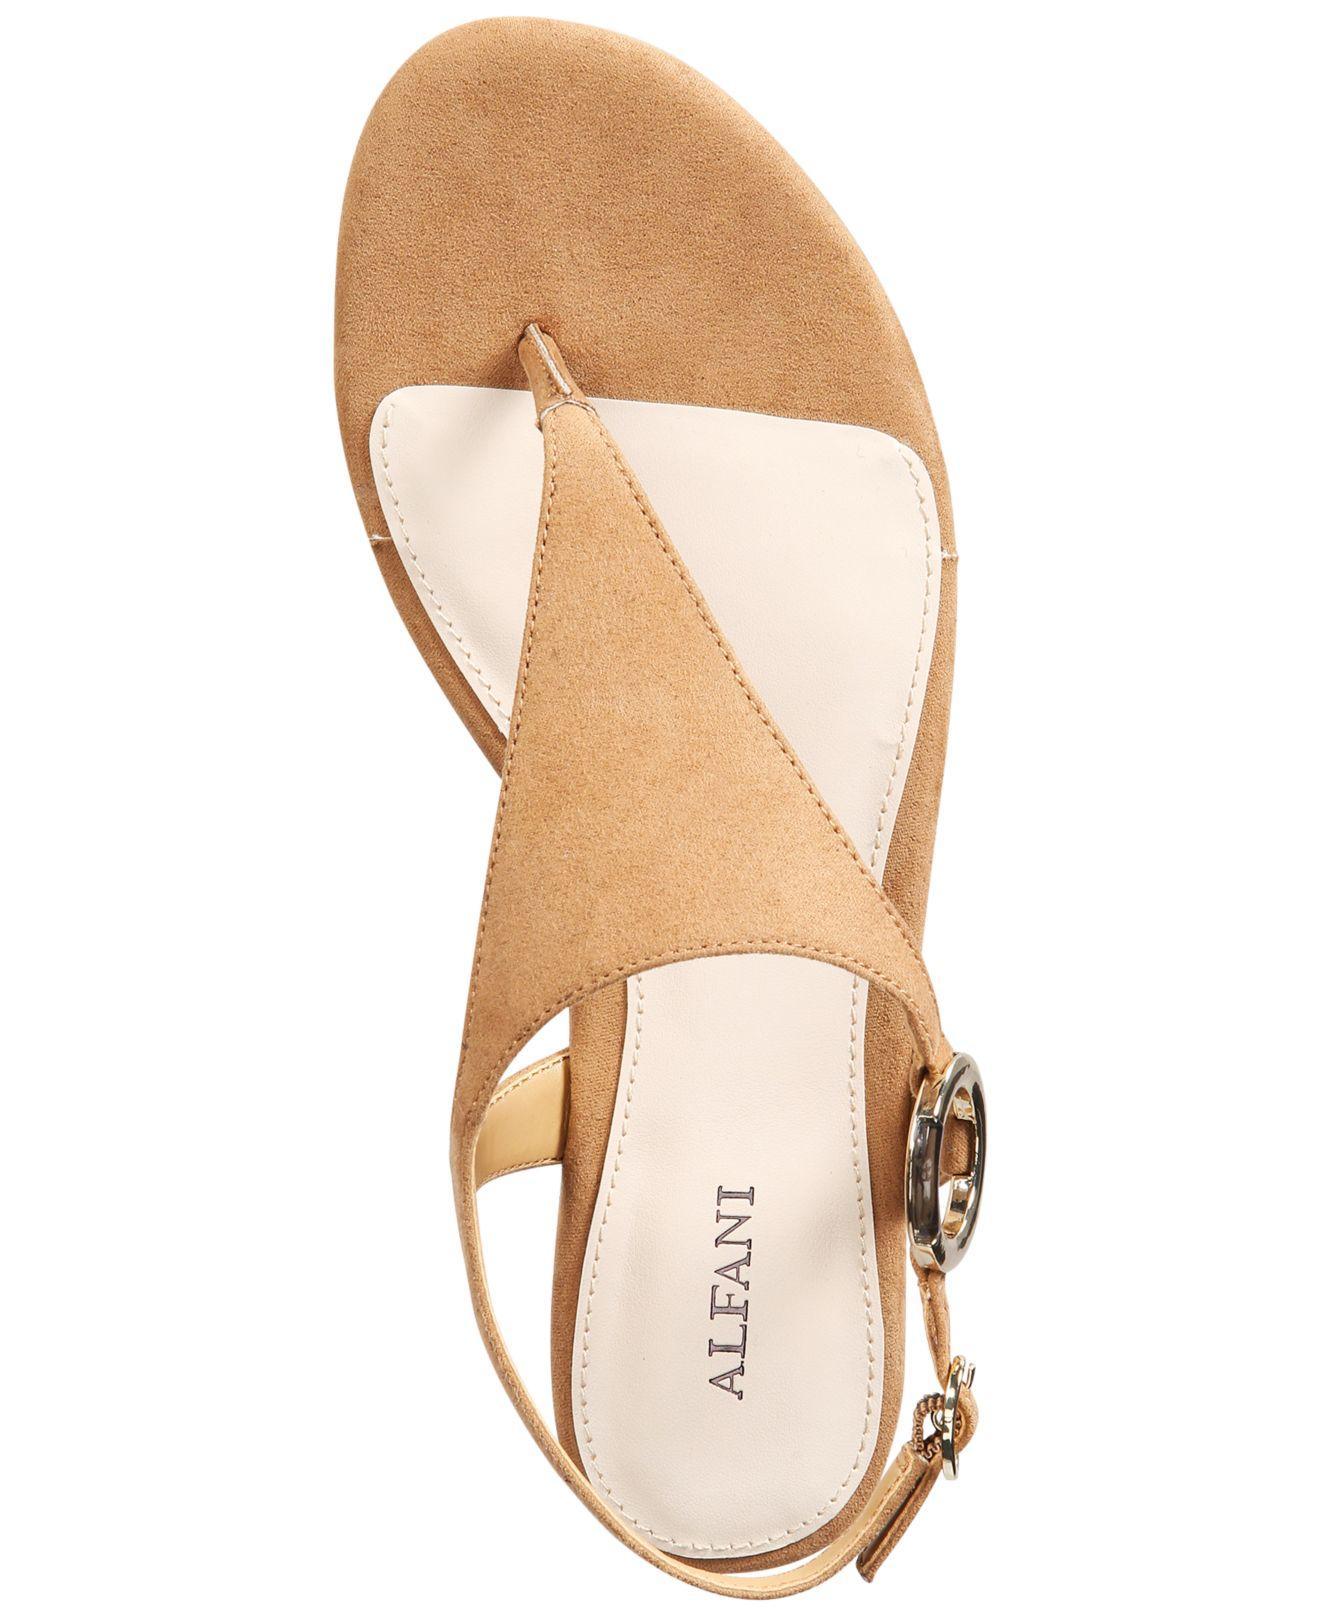 6e02bd1ec2b5e Alfani Womens Honnee Open Toe Casual Ankle Strap Sandals